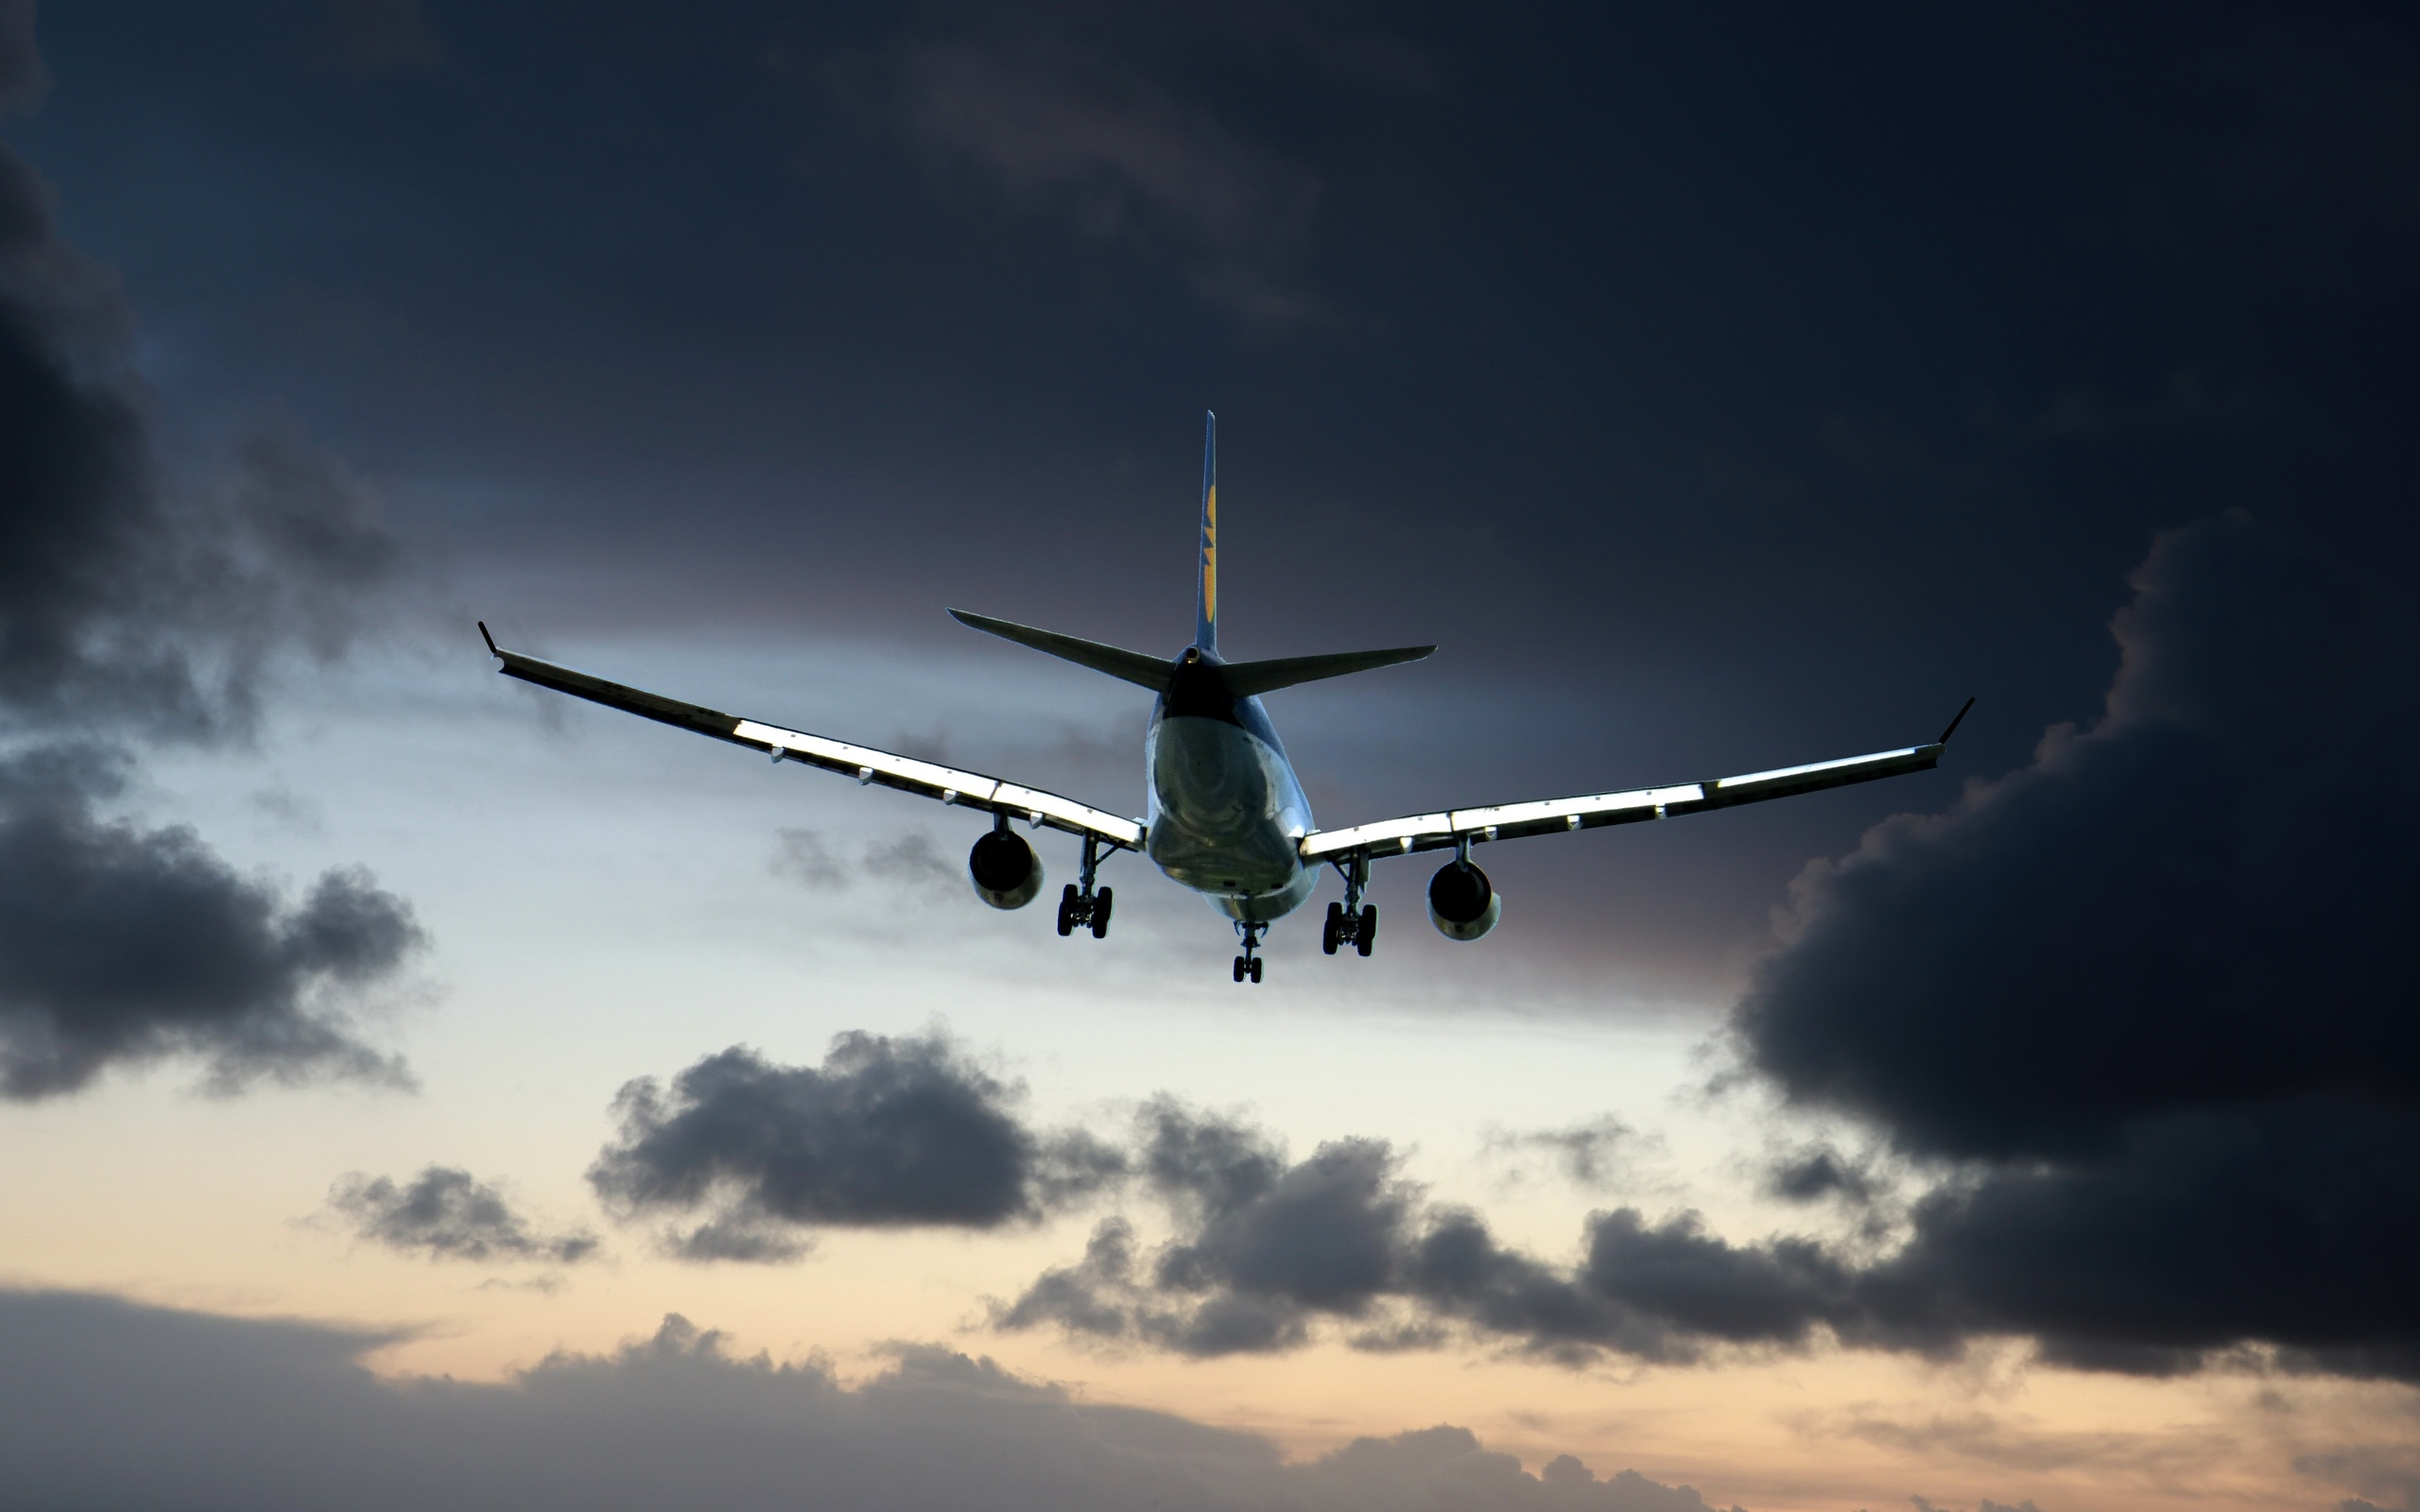 небо, самолет, посадка